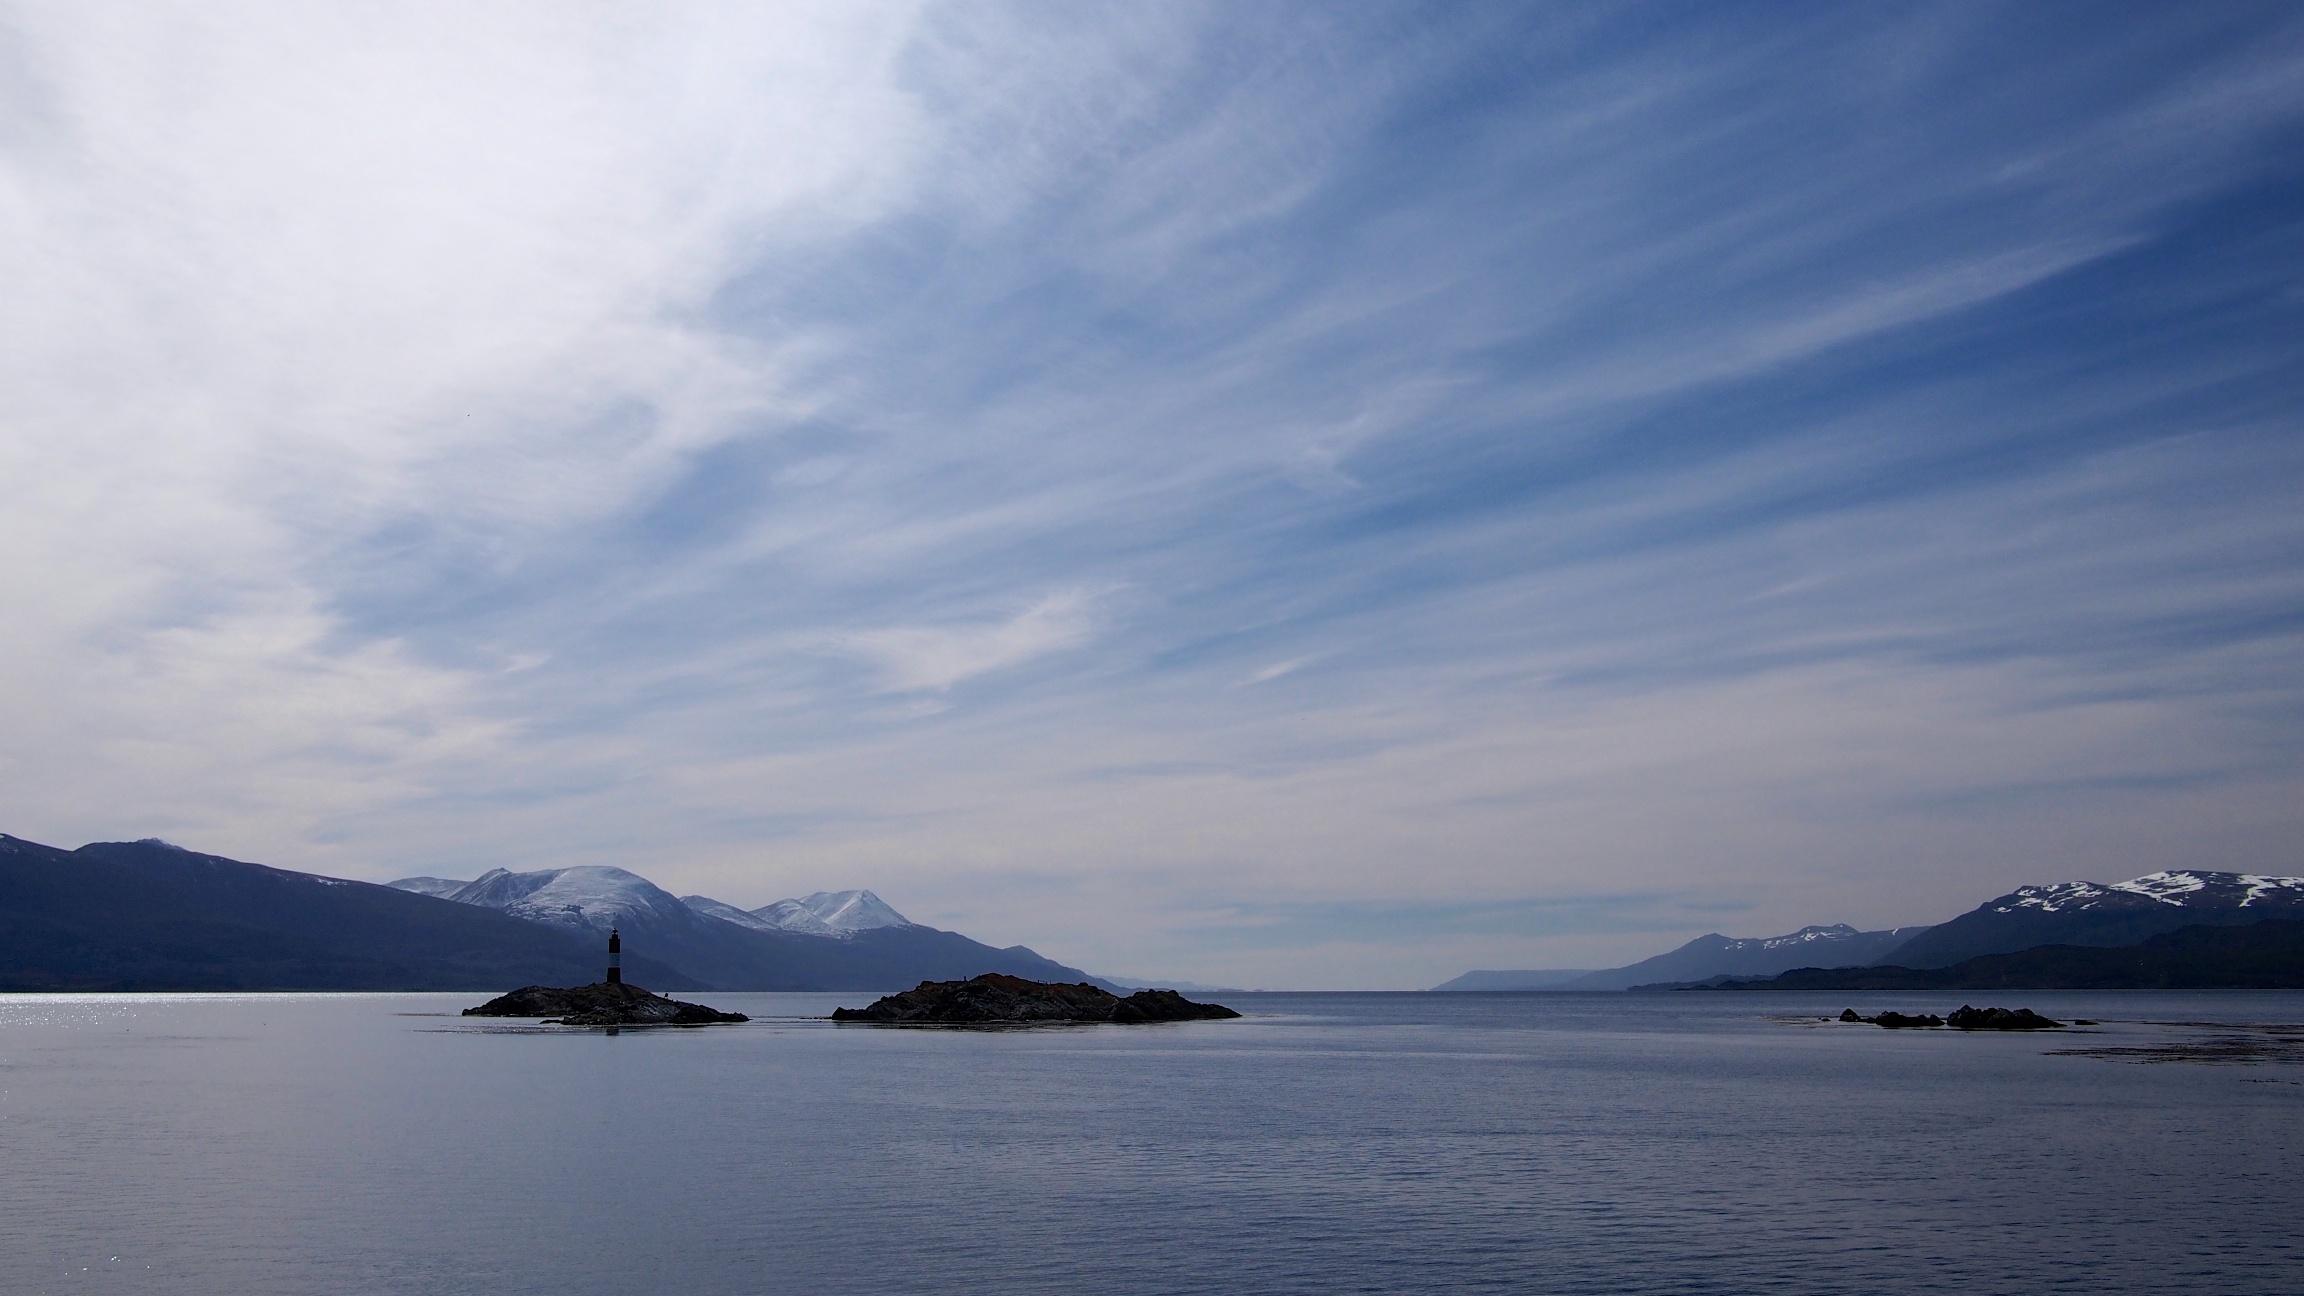 A distant shot of Les Eclaireurs Lighthouse